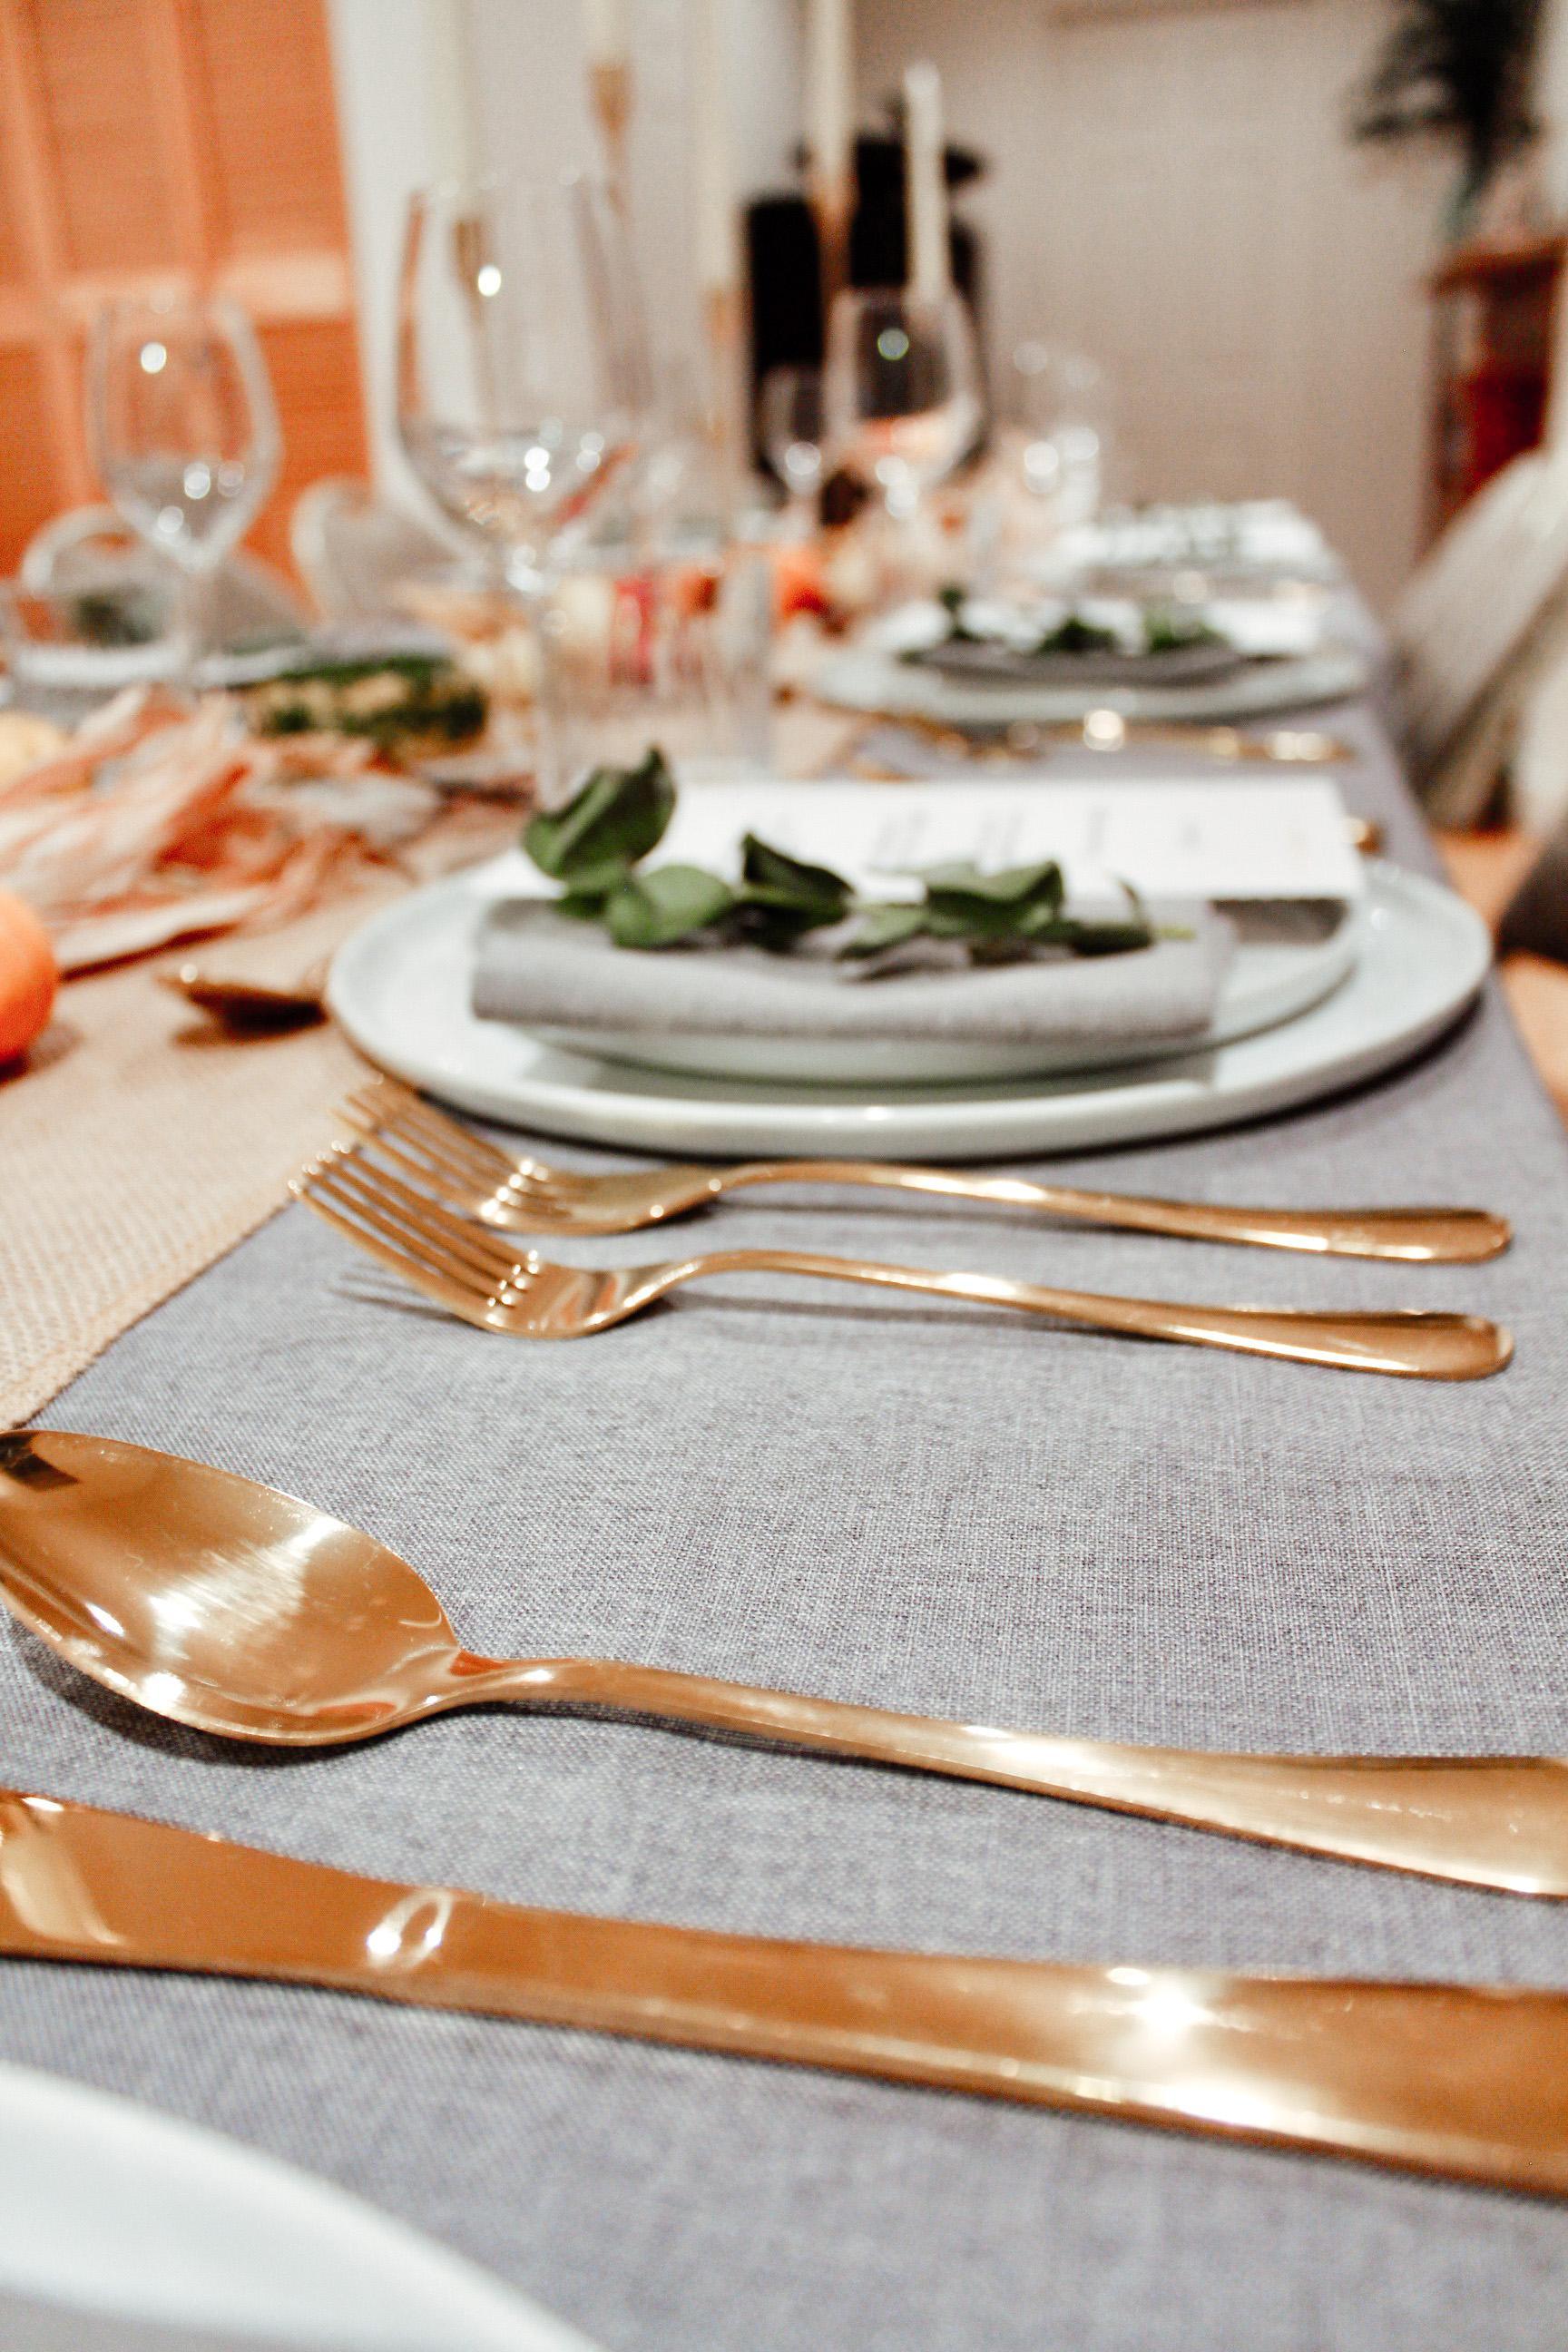 E.A.Together's Seasonal Winter 2020 Dinner